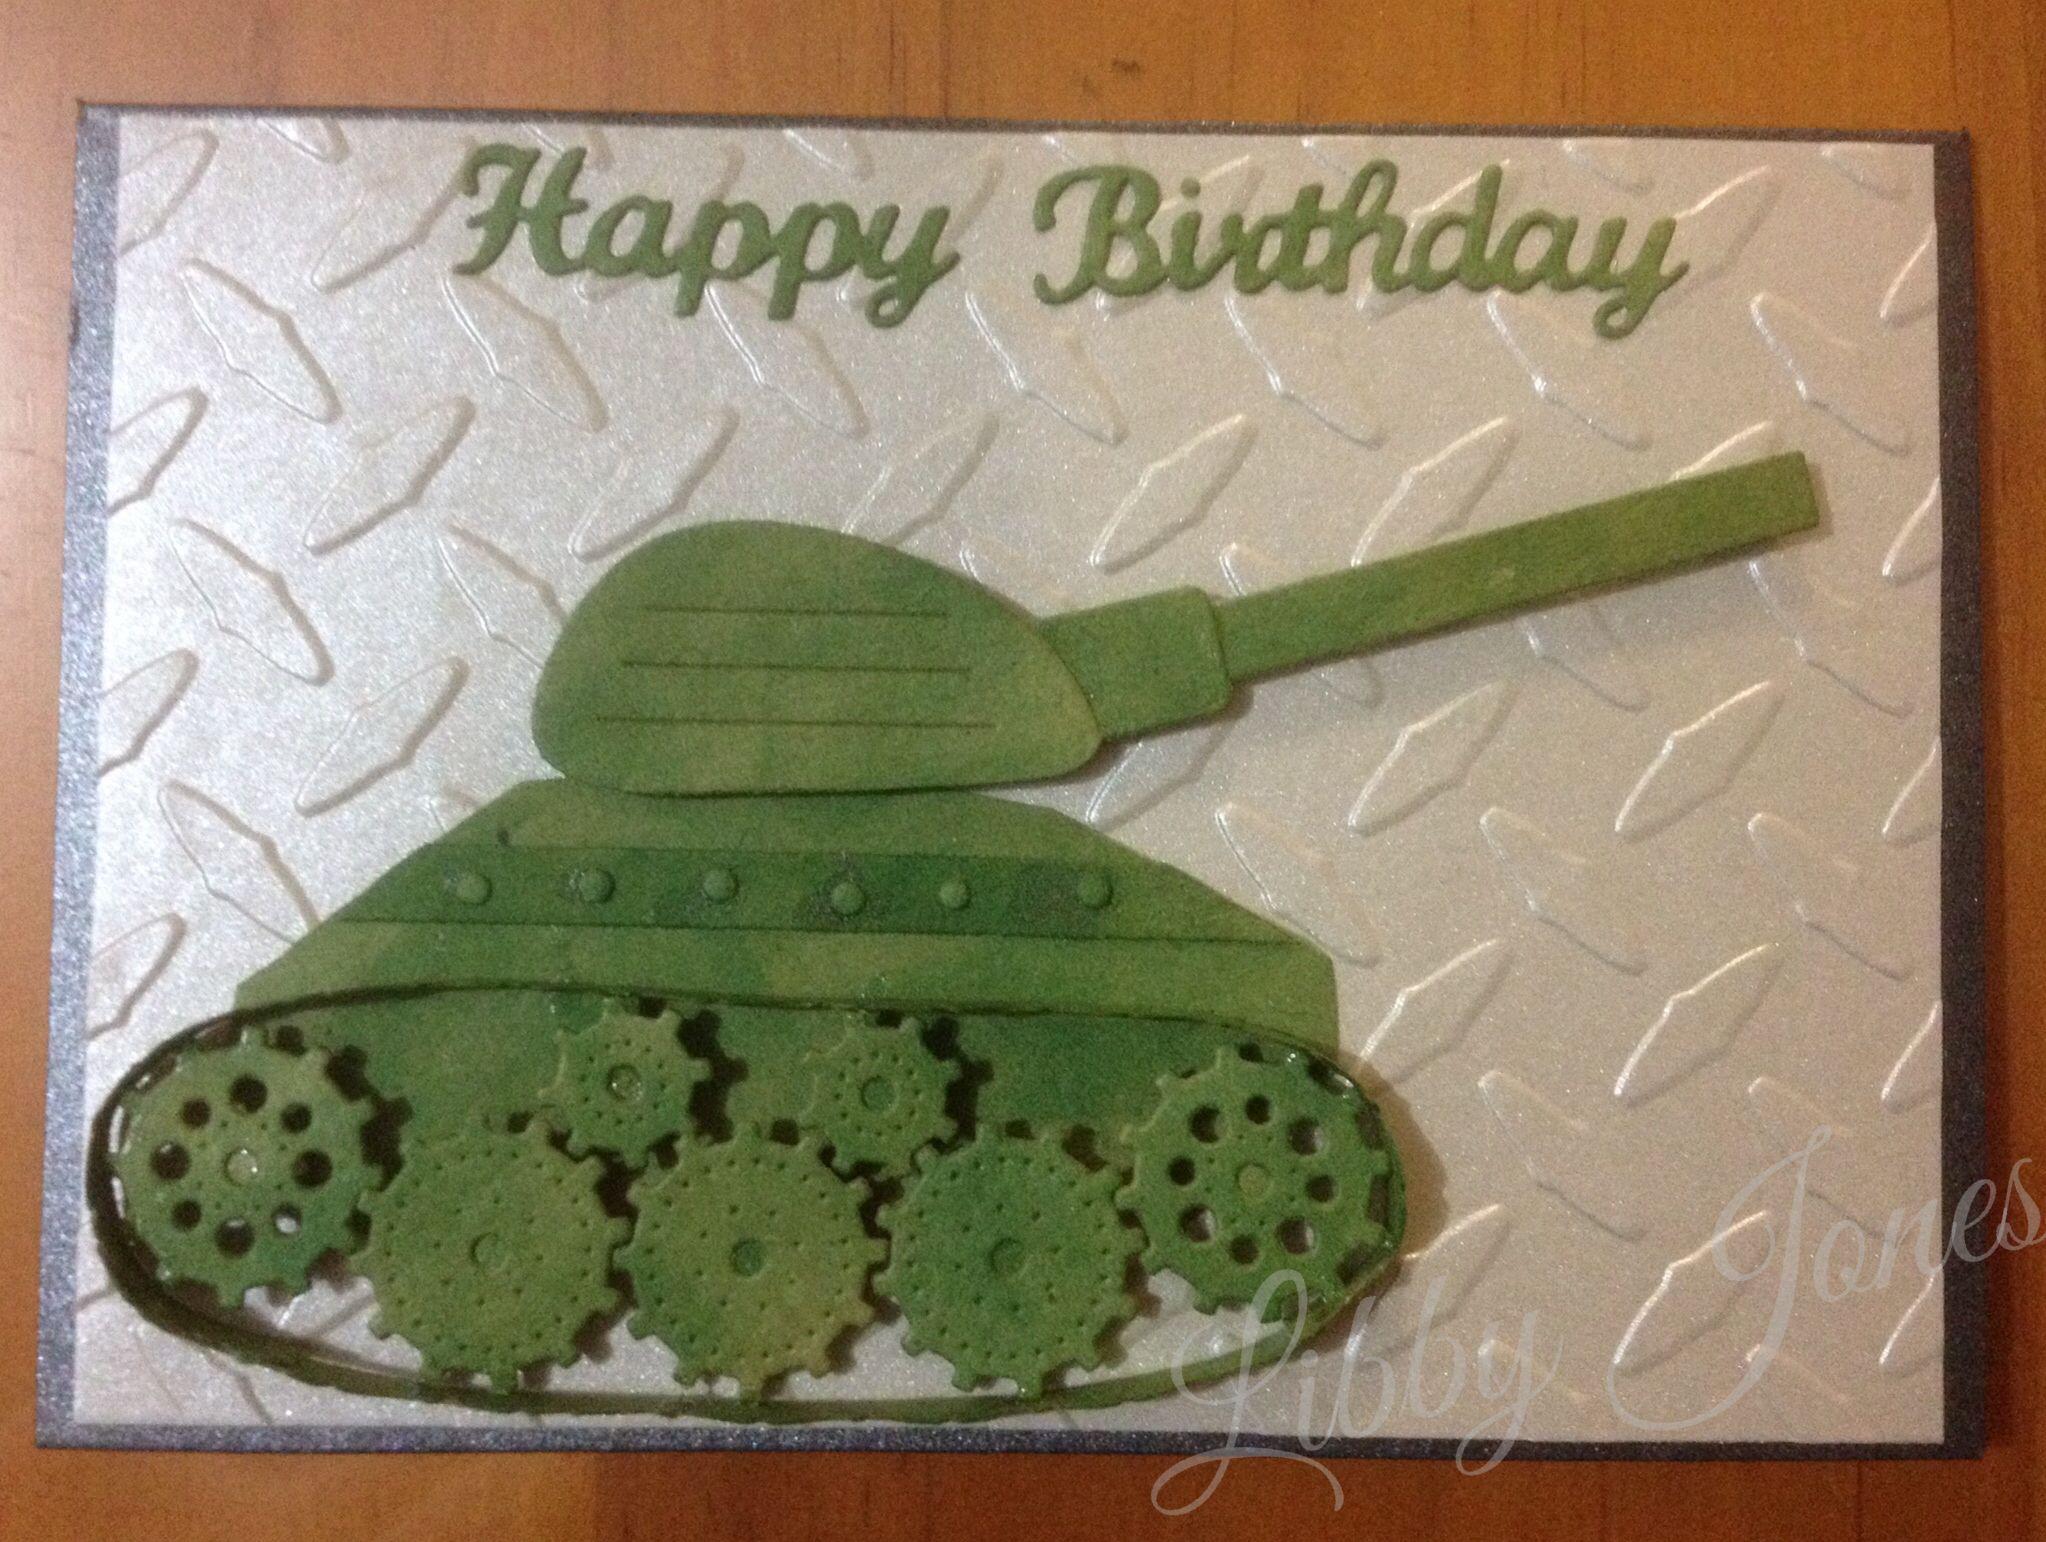 Army Tank birthday card libjj Cards libjj – Army Birthday Cards